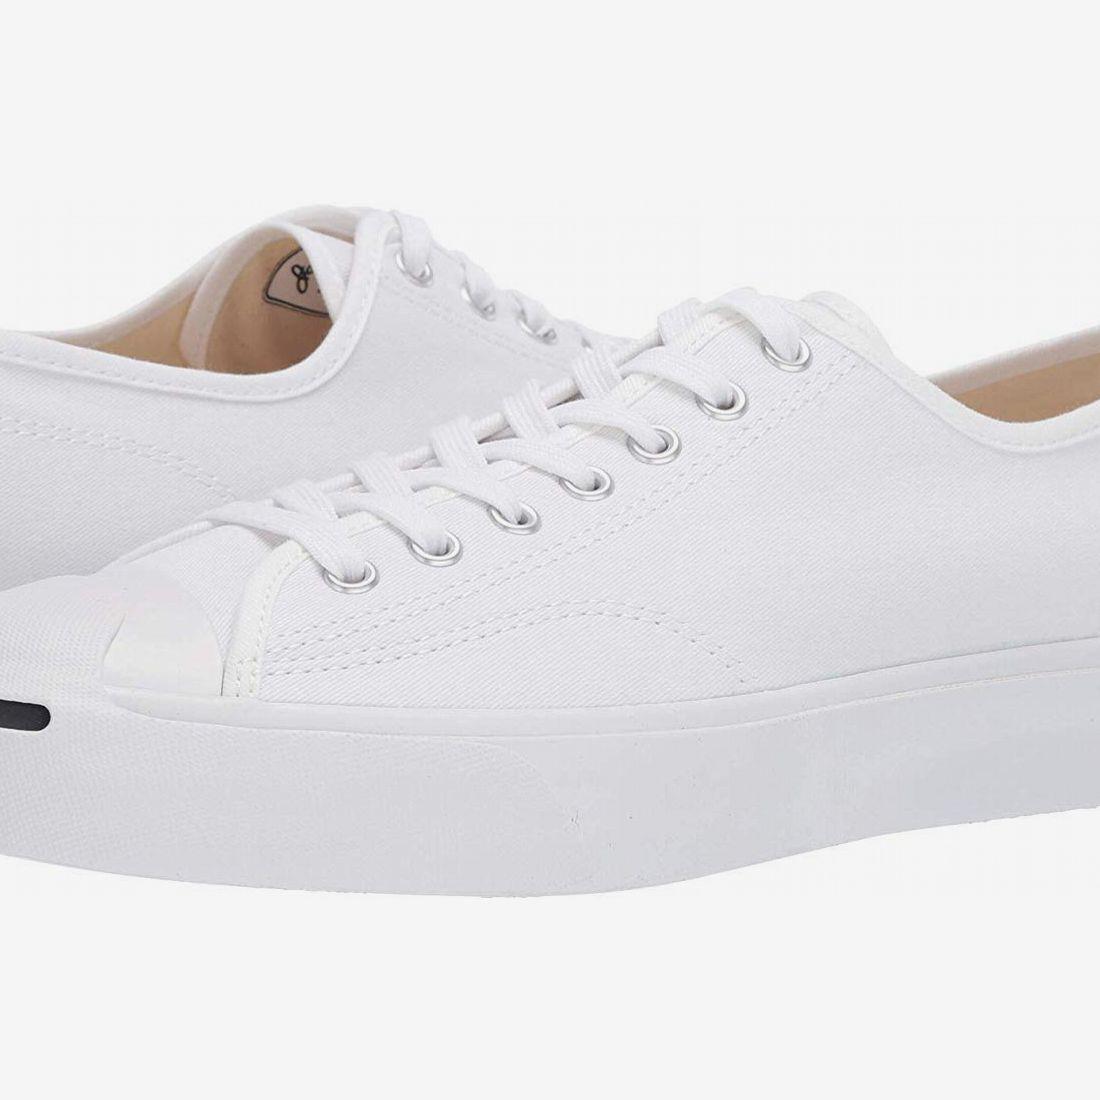 low cut sneakers